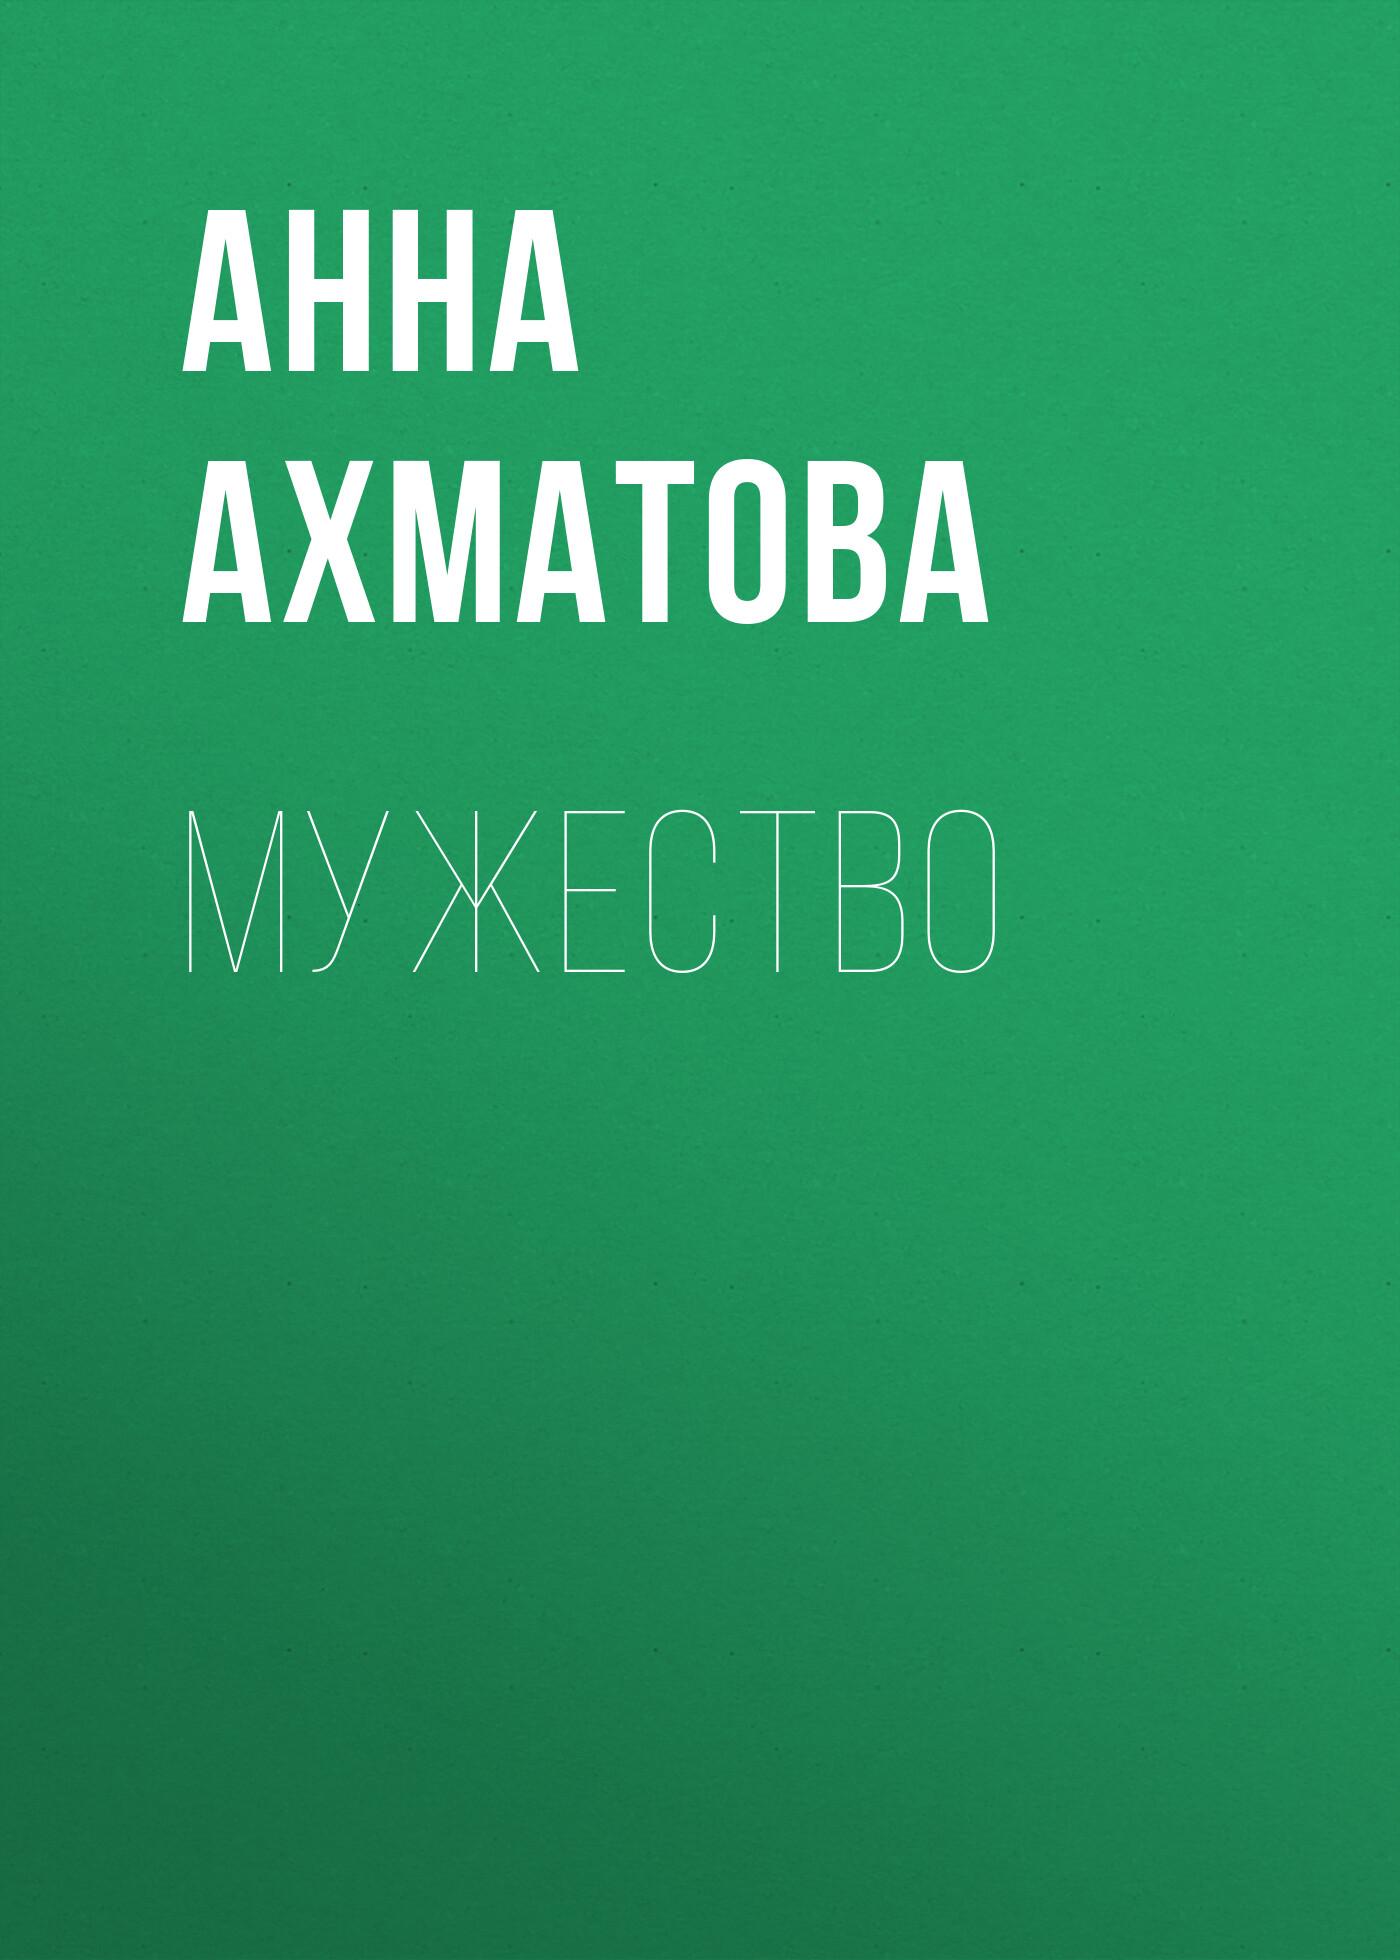 Анна Ахматова Мужество что такое ip покрытие на часах отзывы